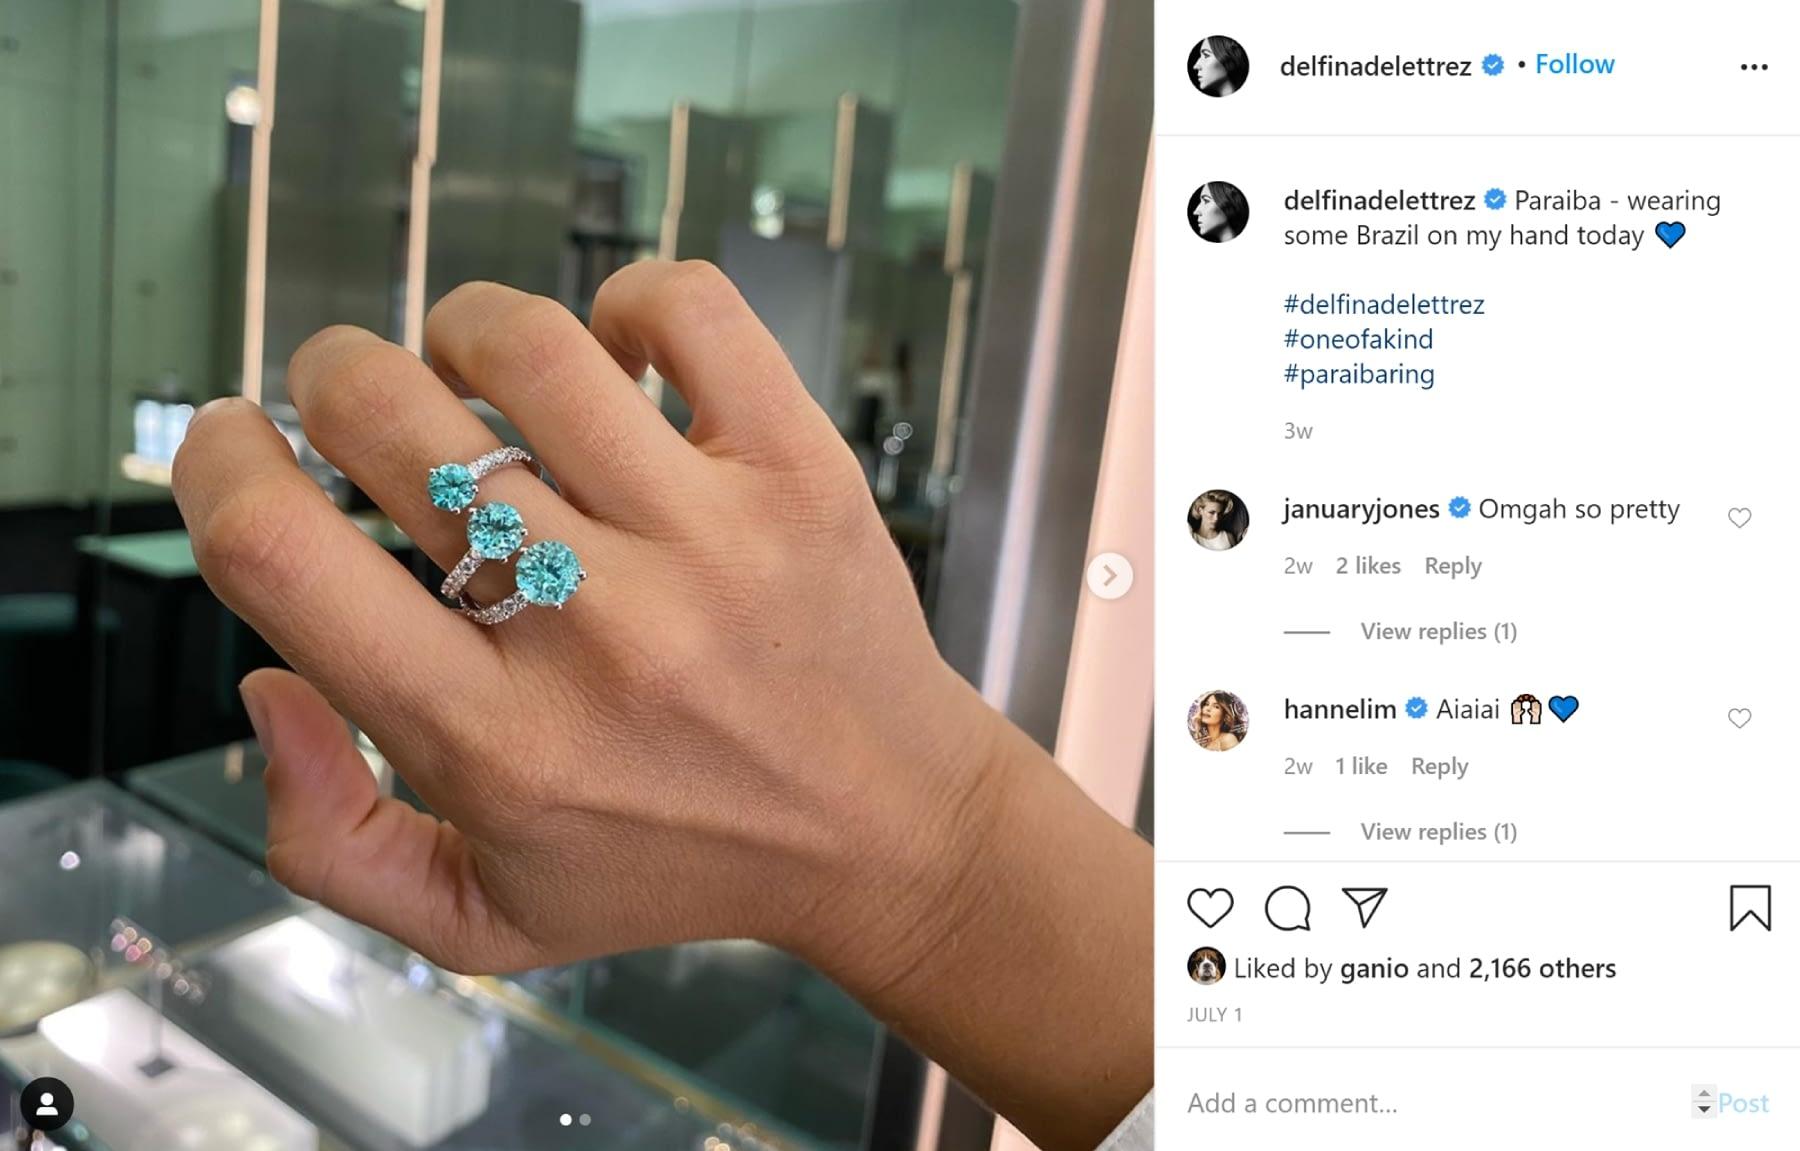 How to Get Verified on Instagram: Delfina Delettrezz